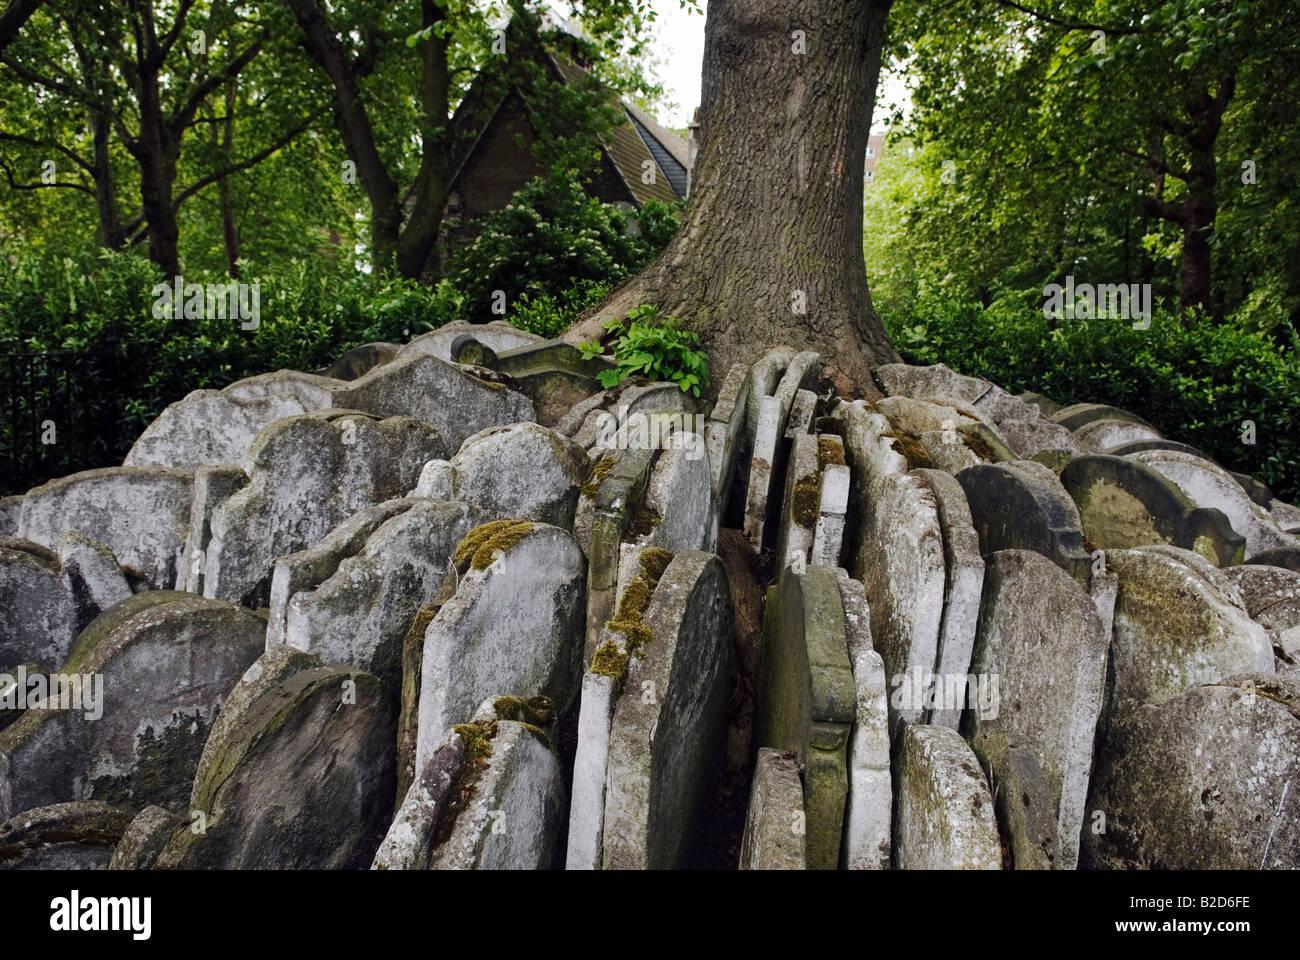 The Hardy Tree, St Pancras Churchyard, London - Stock Image